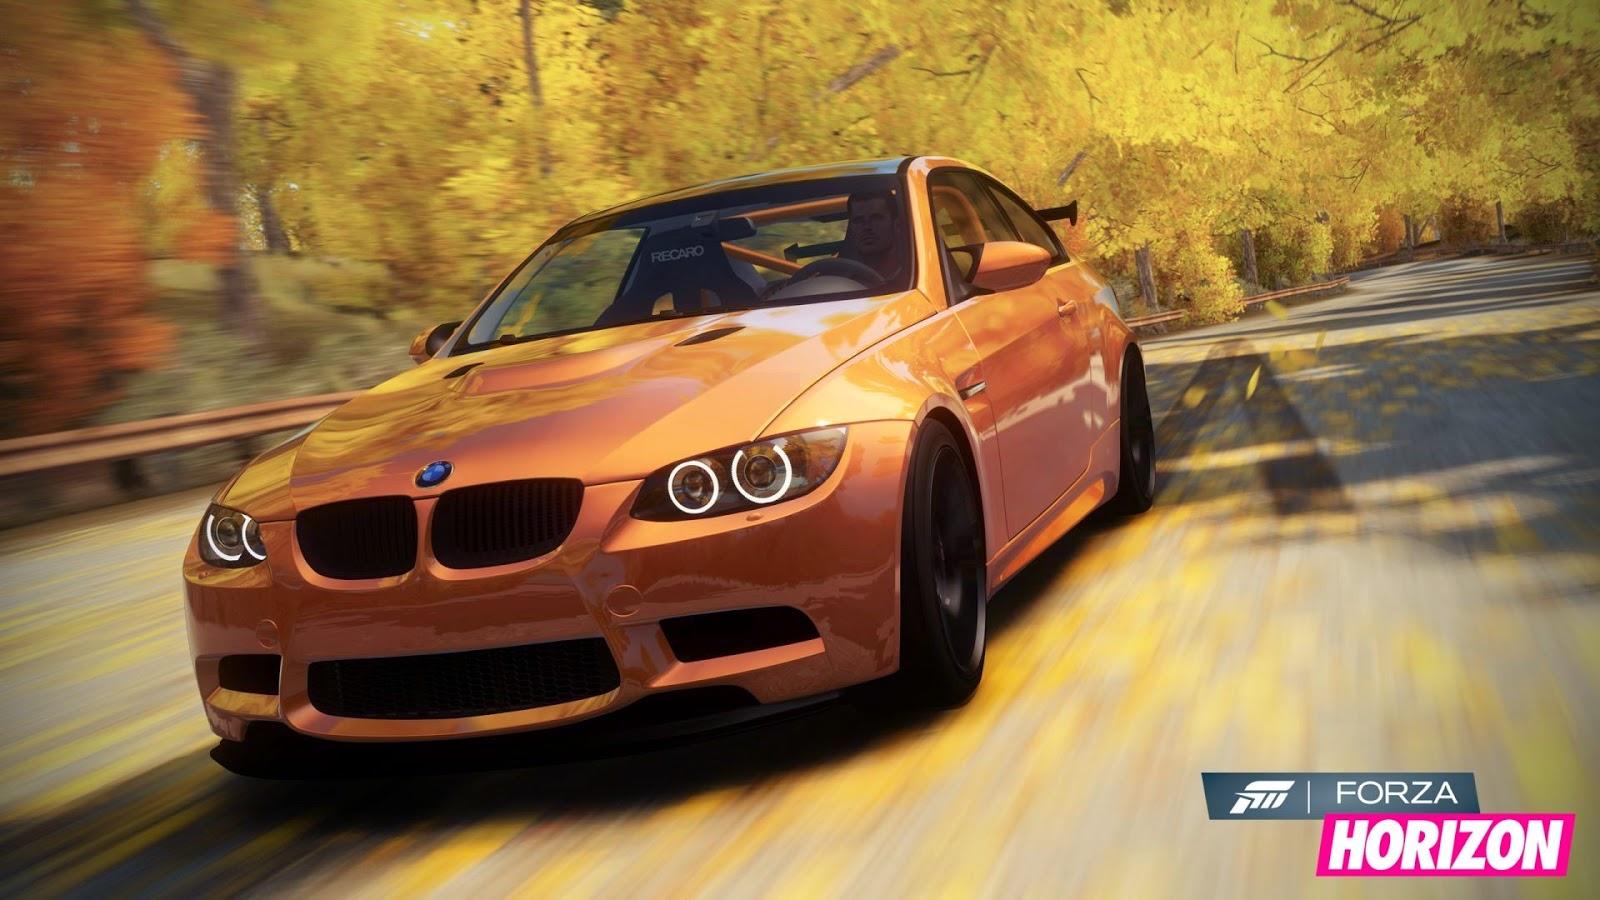 WallpapersKu Forza Horizon Game Wallpapers